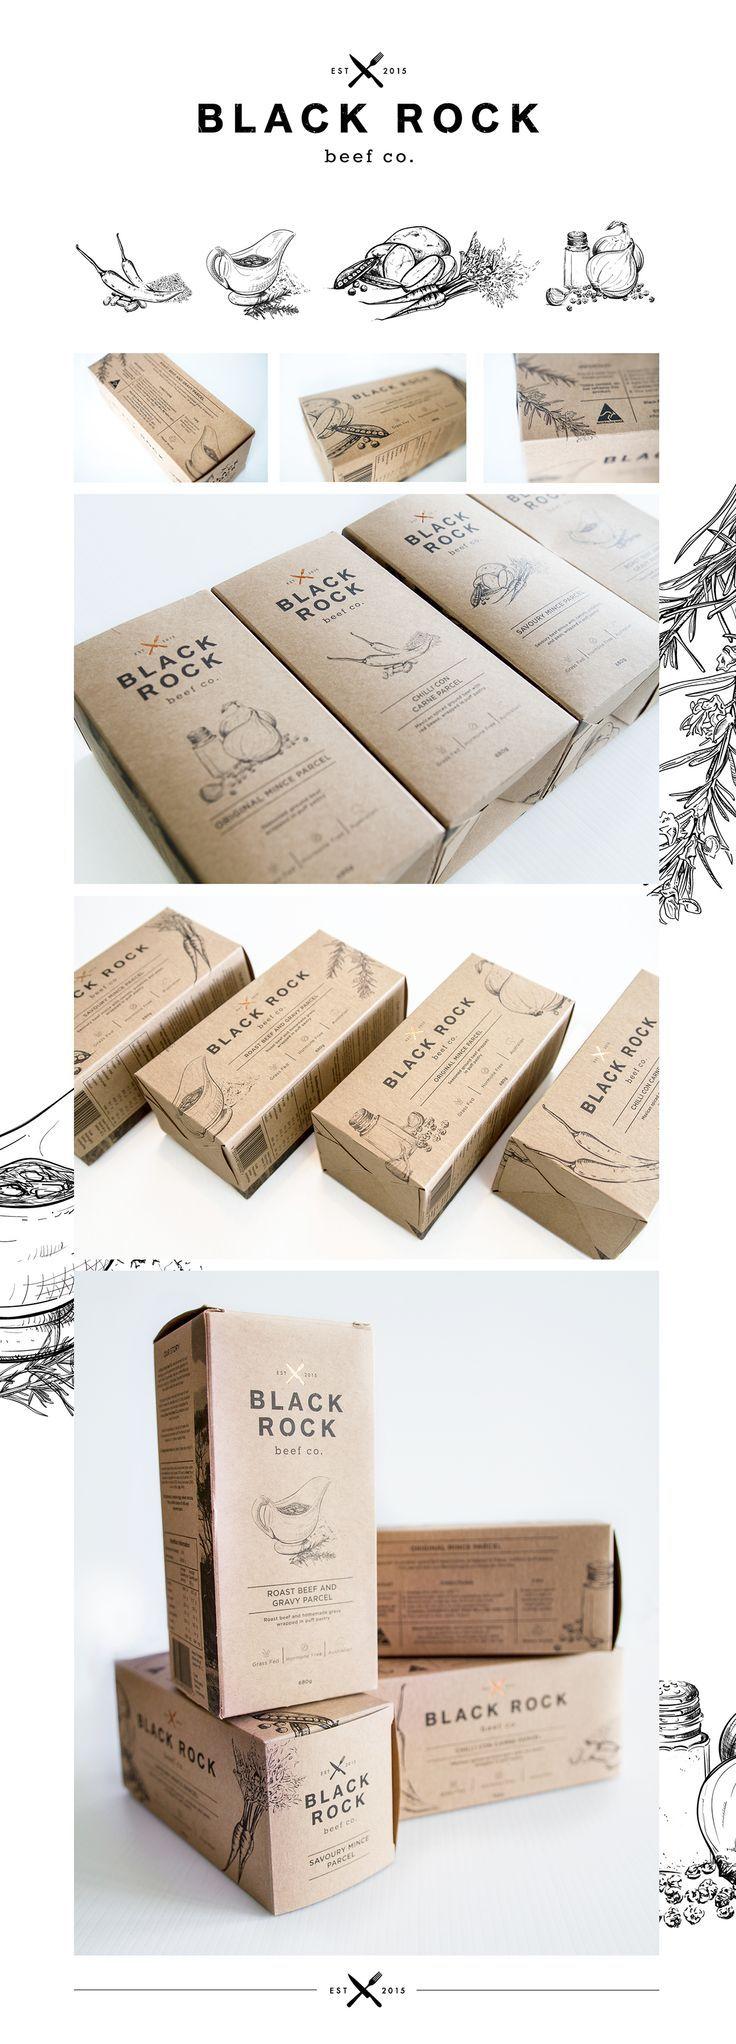 Black Rock Beef co.| Packaging Design on Behance ||